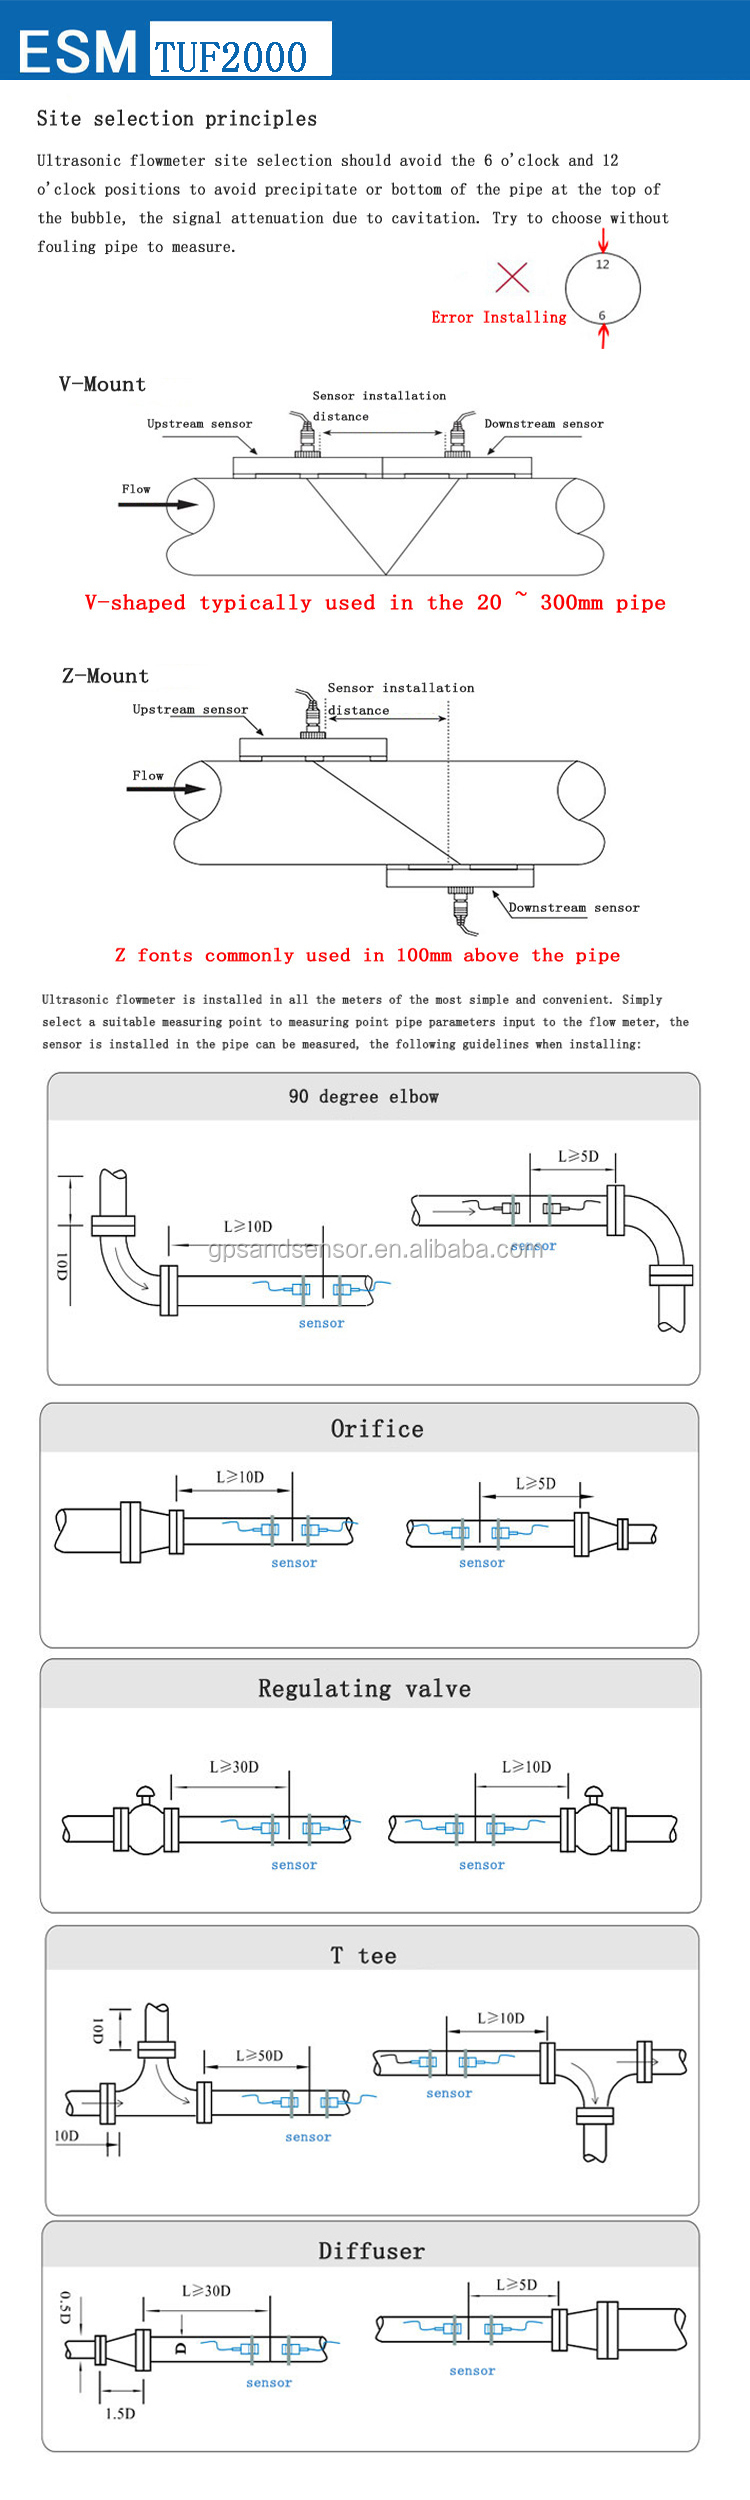 medium resolution of french cheap supersonic flow meter ultrasonic btu meter price